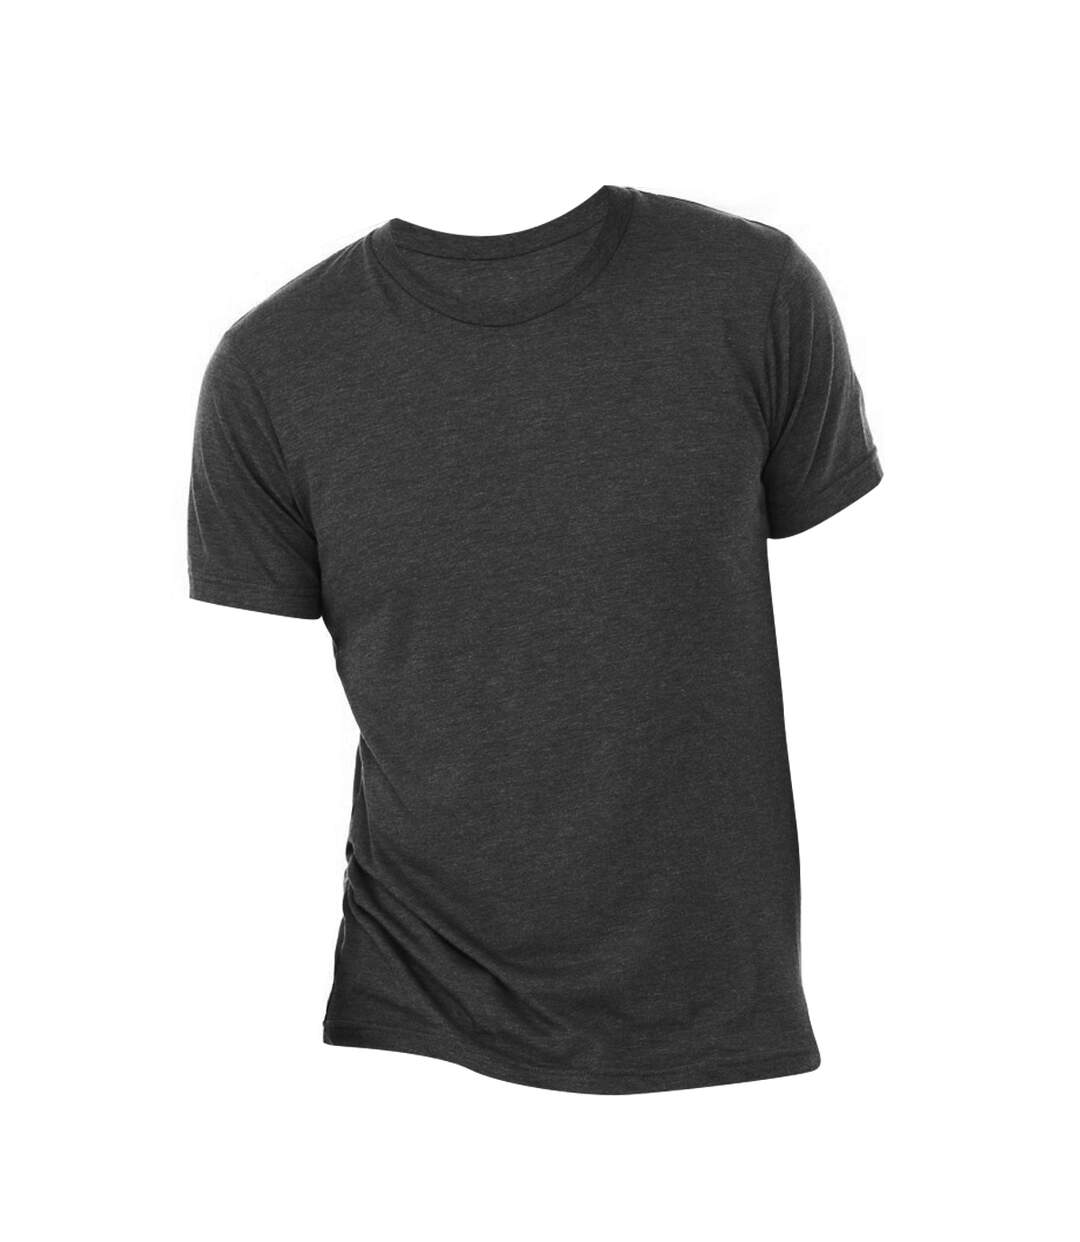 Canvas Mens Triblend Crew Neck Plain Short Sleeve T-Shirt (Charcoal Black Triblend) - UTBC2596